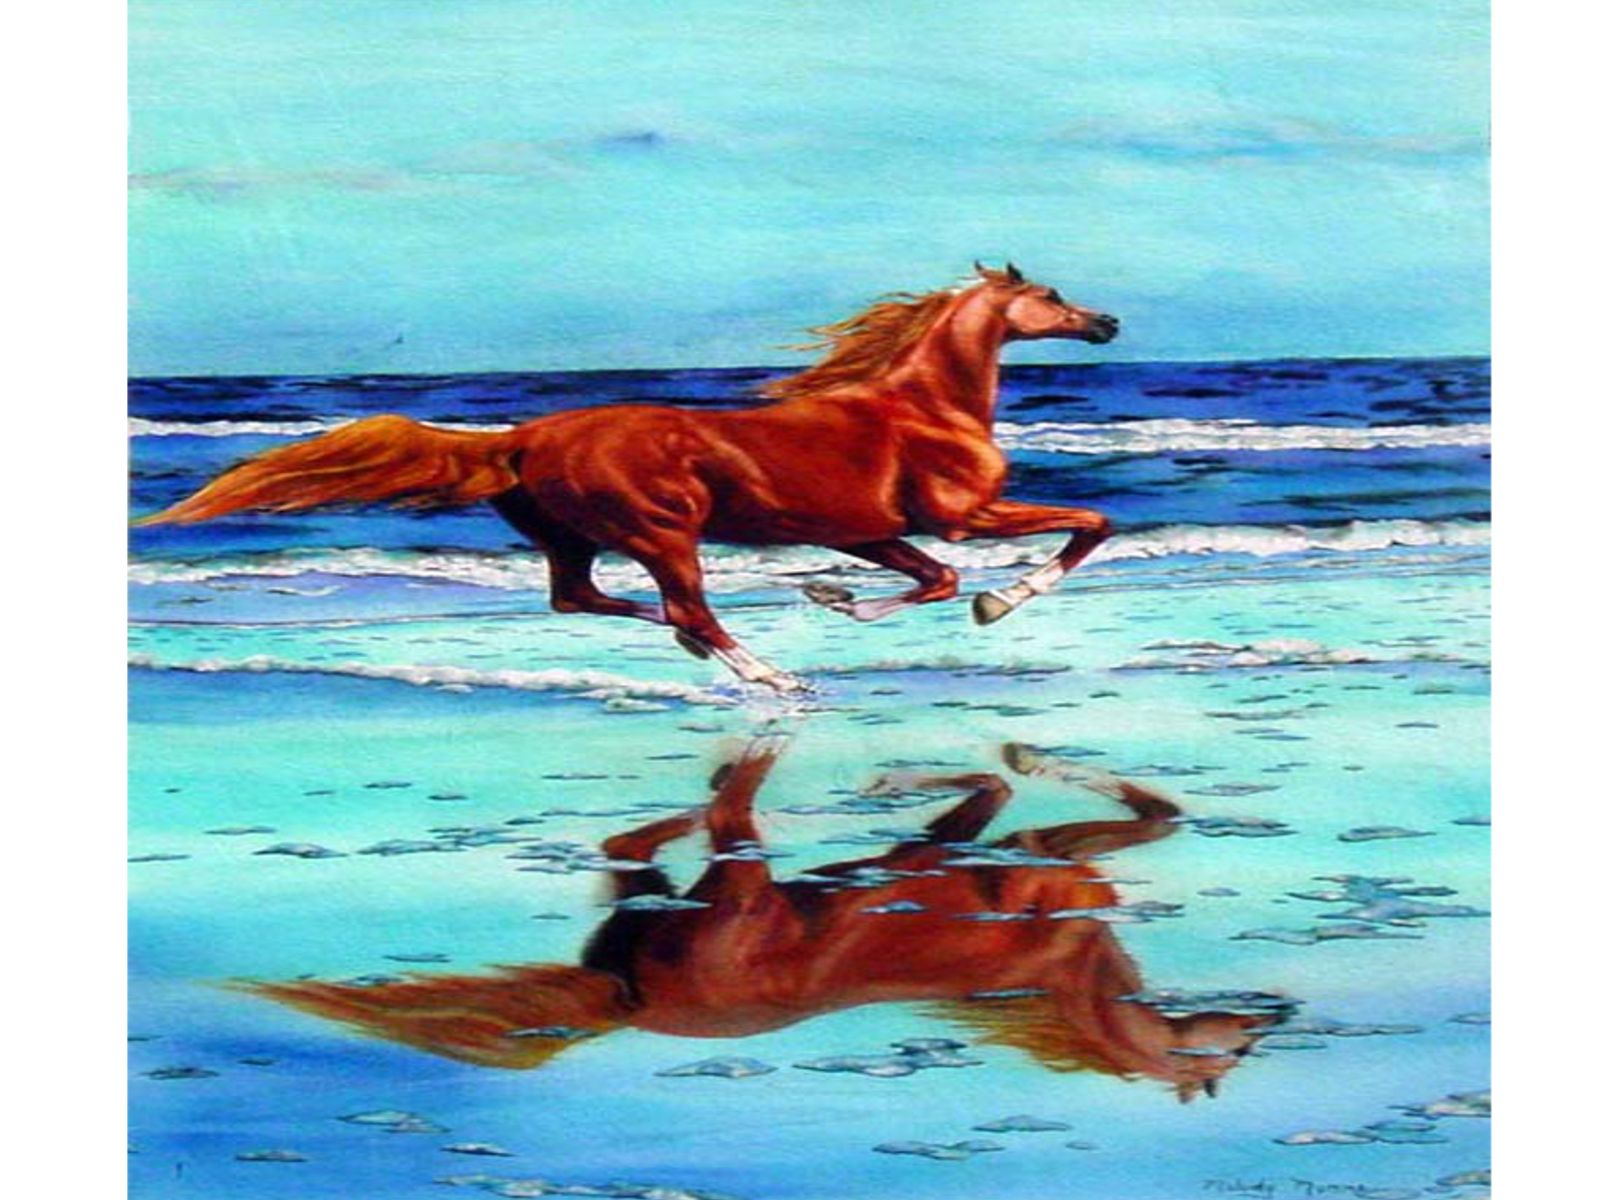 Amazing Wallpaper Horse Watercolor - e49eff0afcc94e05109d1b1d9e571c5a  Perfect Image Reference_236013.jpg